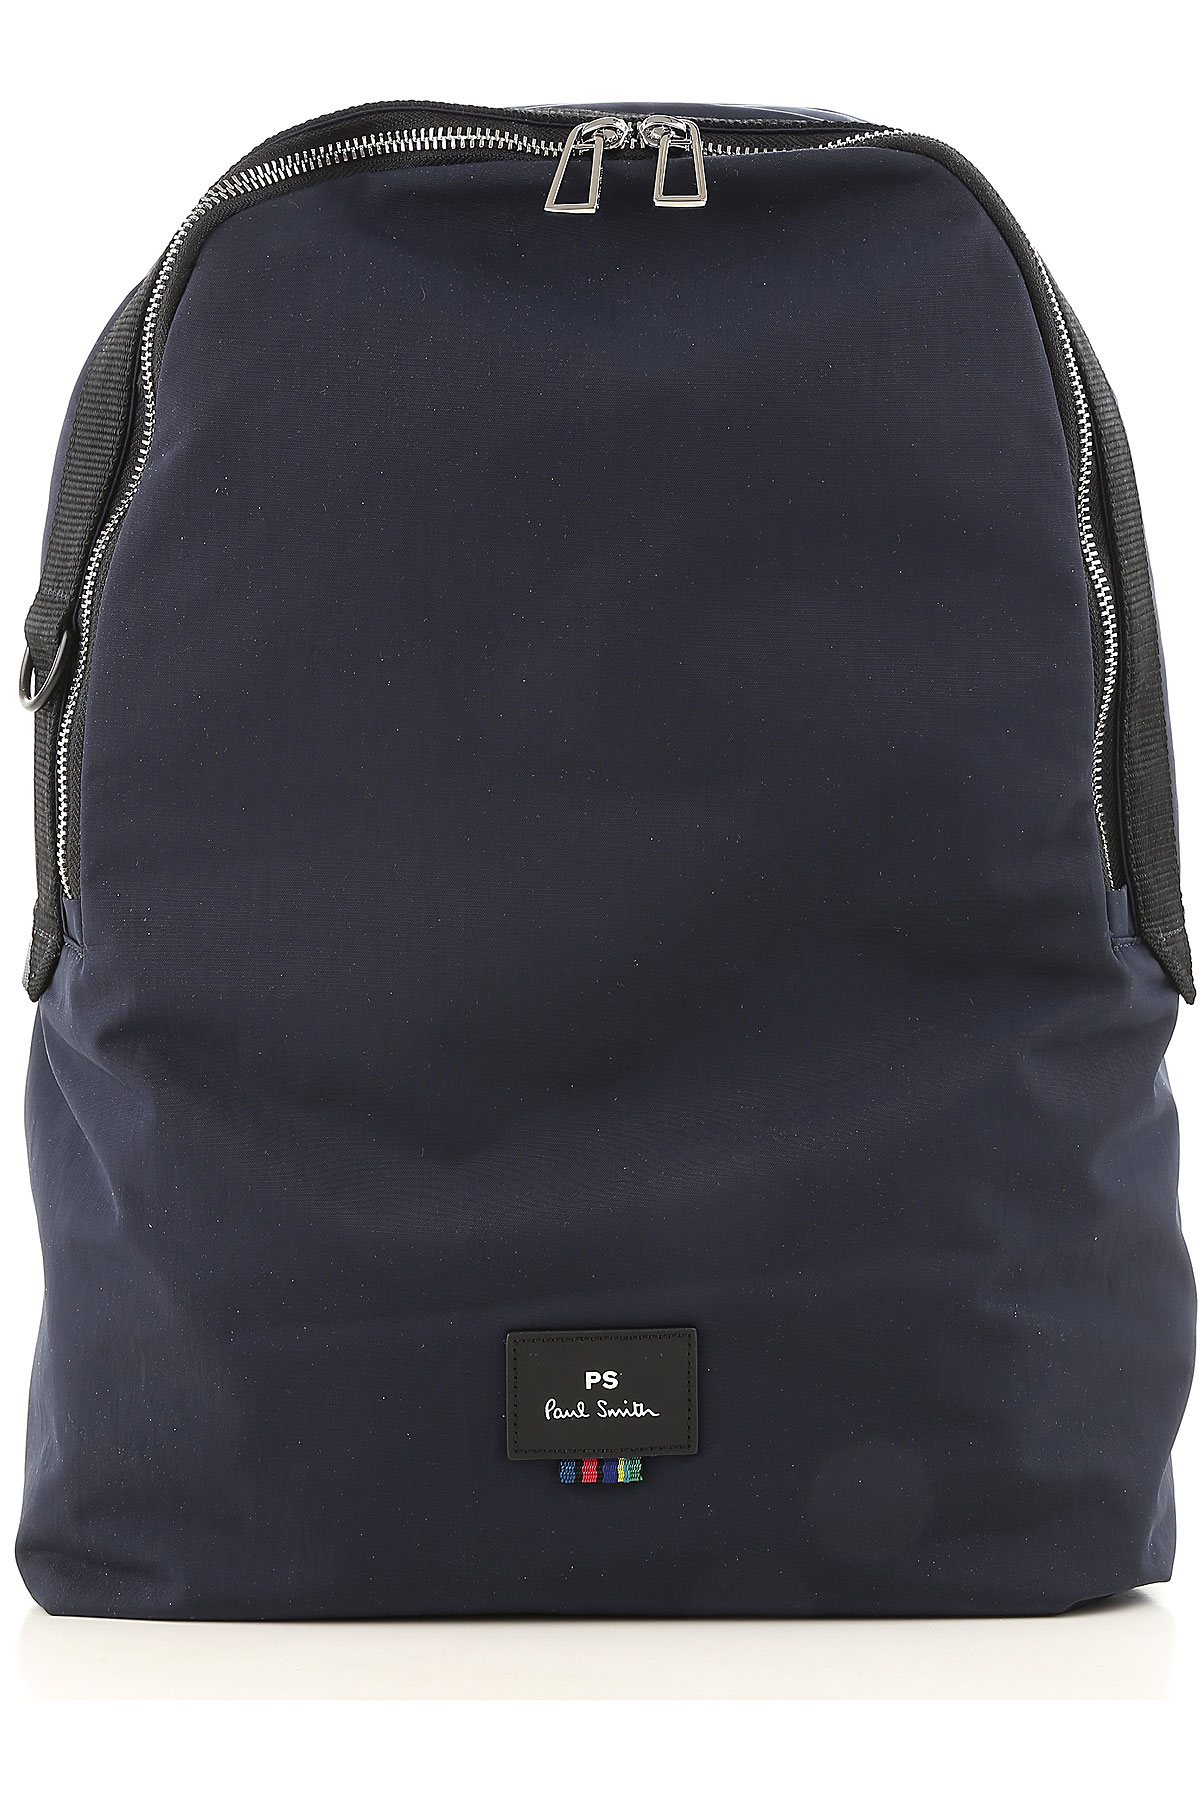 Image of Paul Smith Backpack for Men, Midnight, Nylon, 2017